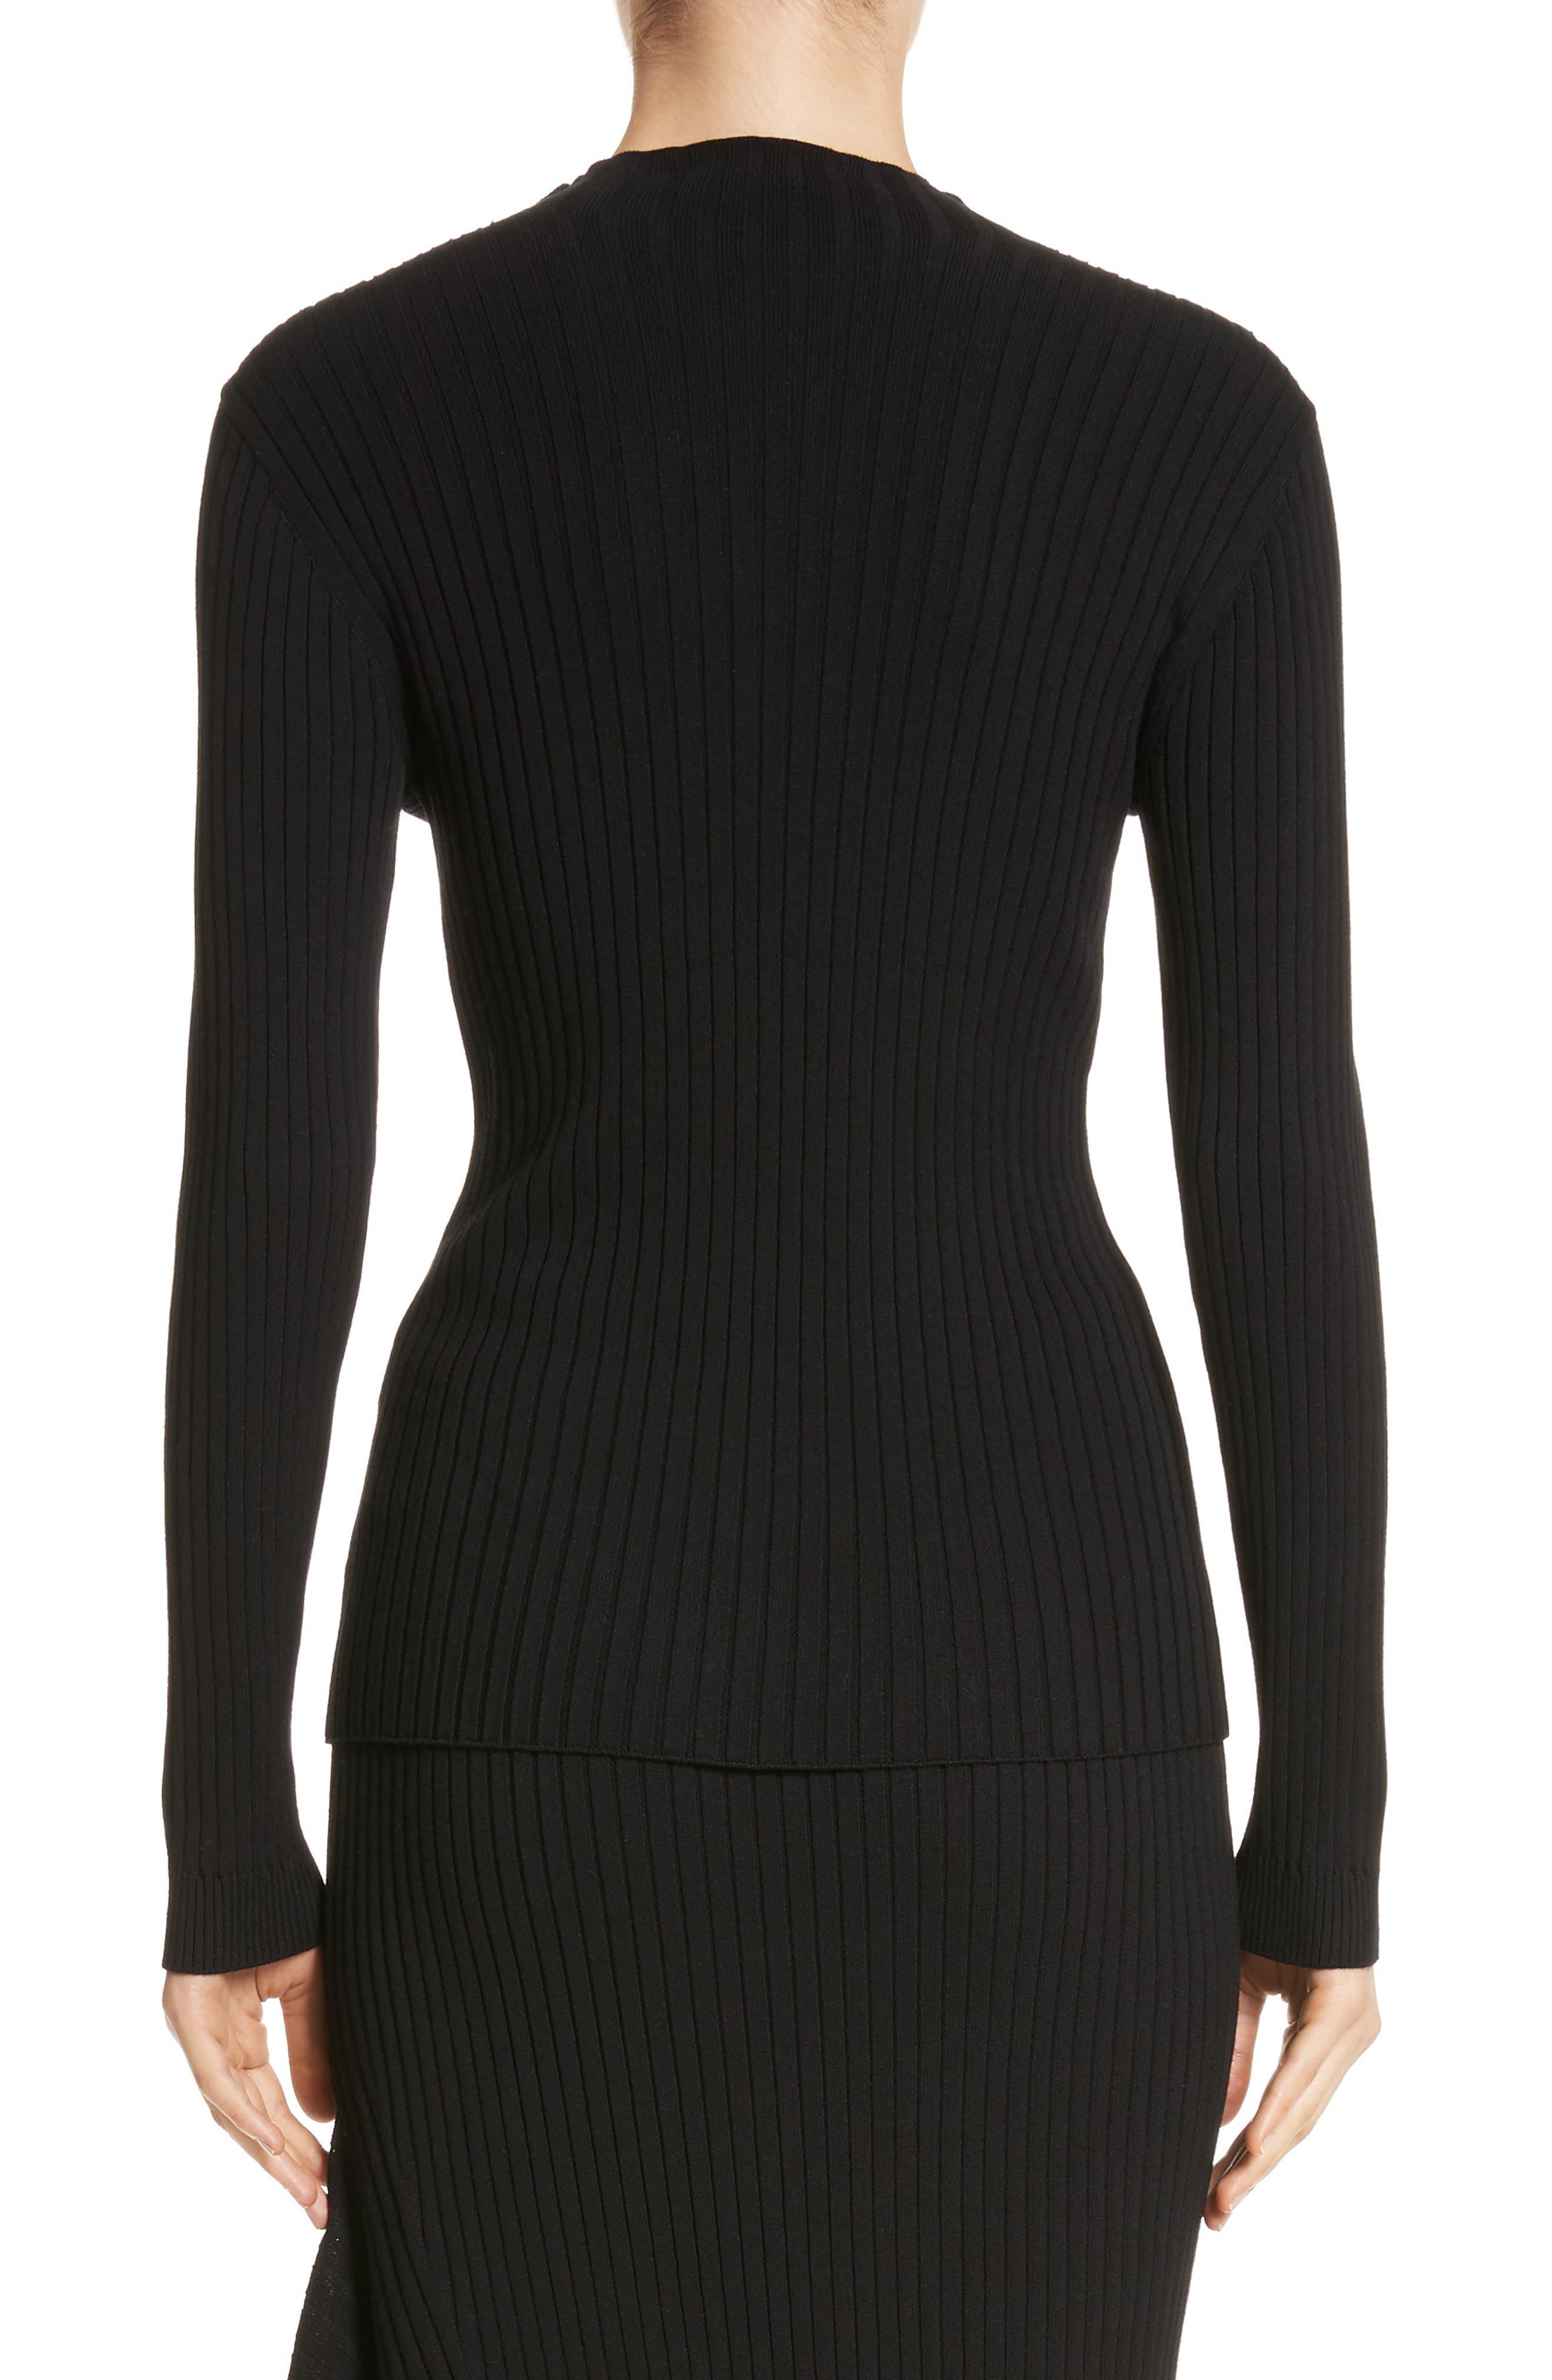 Alternate Image 2  - St. John Collection Flat Rib Knit Mock Neck Sweater